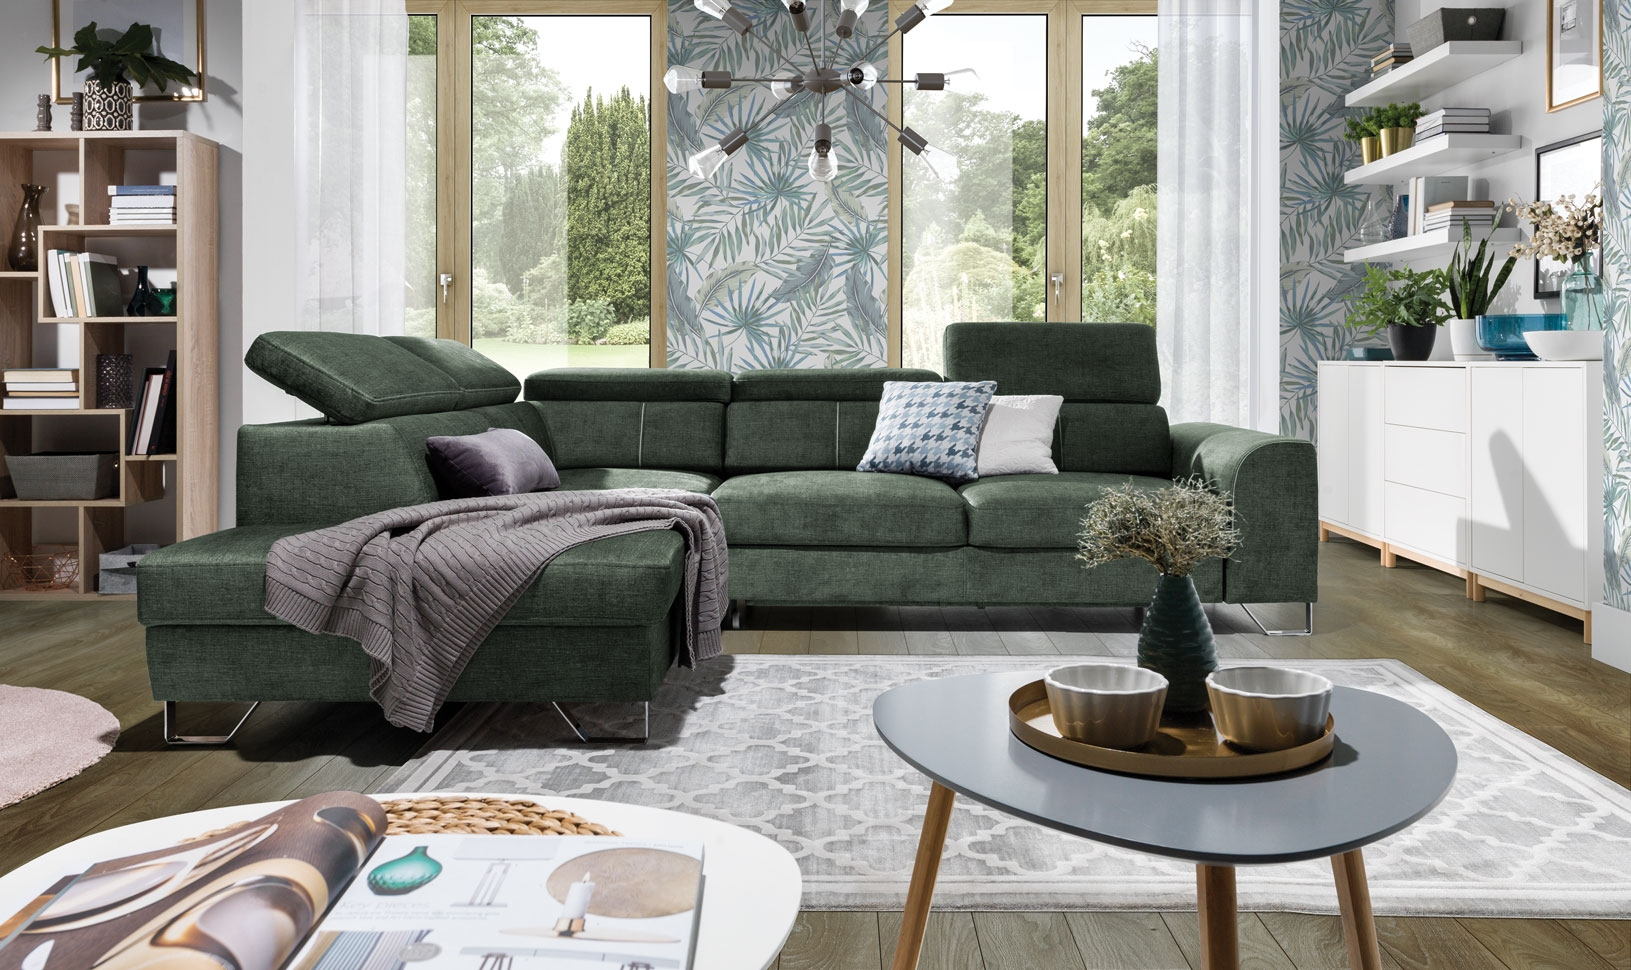 Coltar extensibil cu lada de depozitare, cu sezlong pe stanga, tapitat cu stofa, Asti Verde, l280xA225xH77 cm